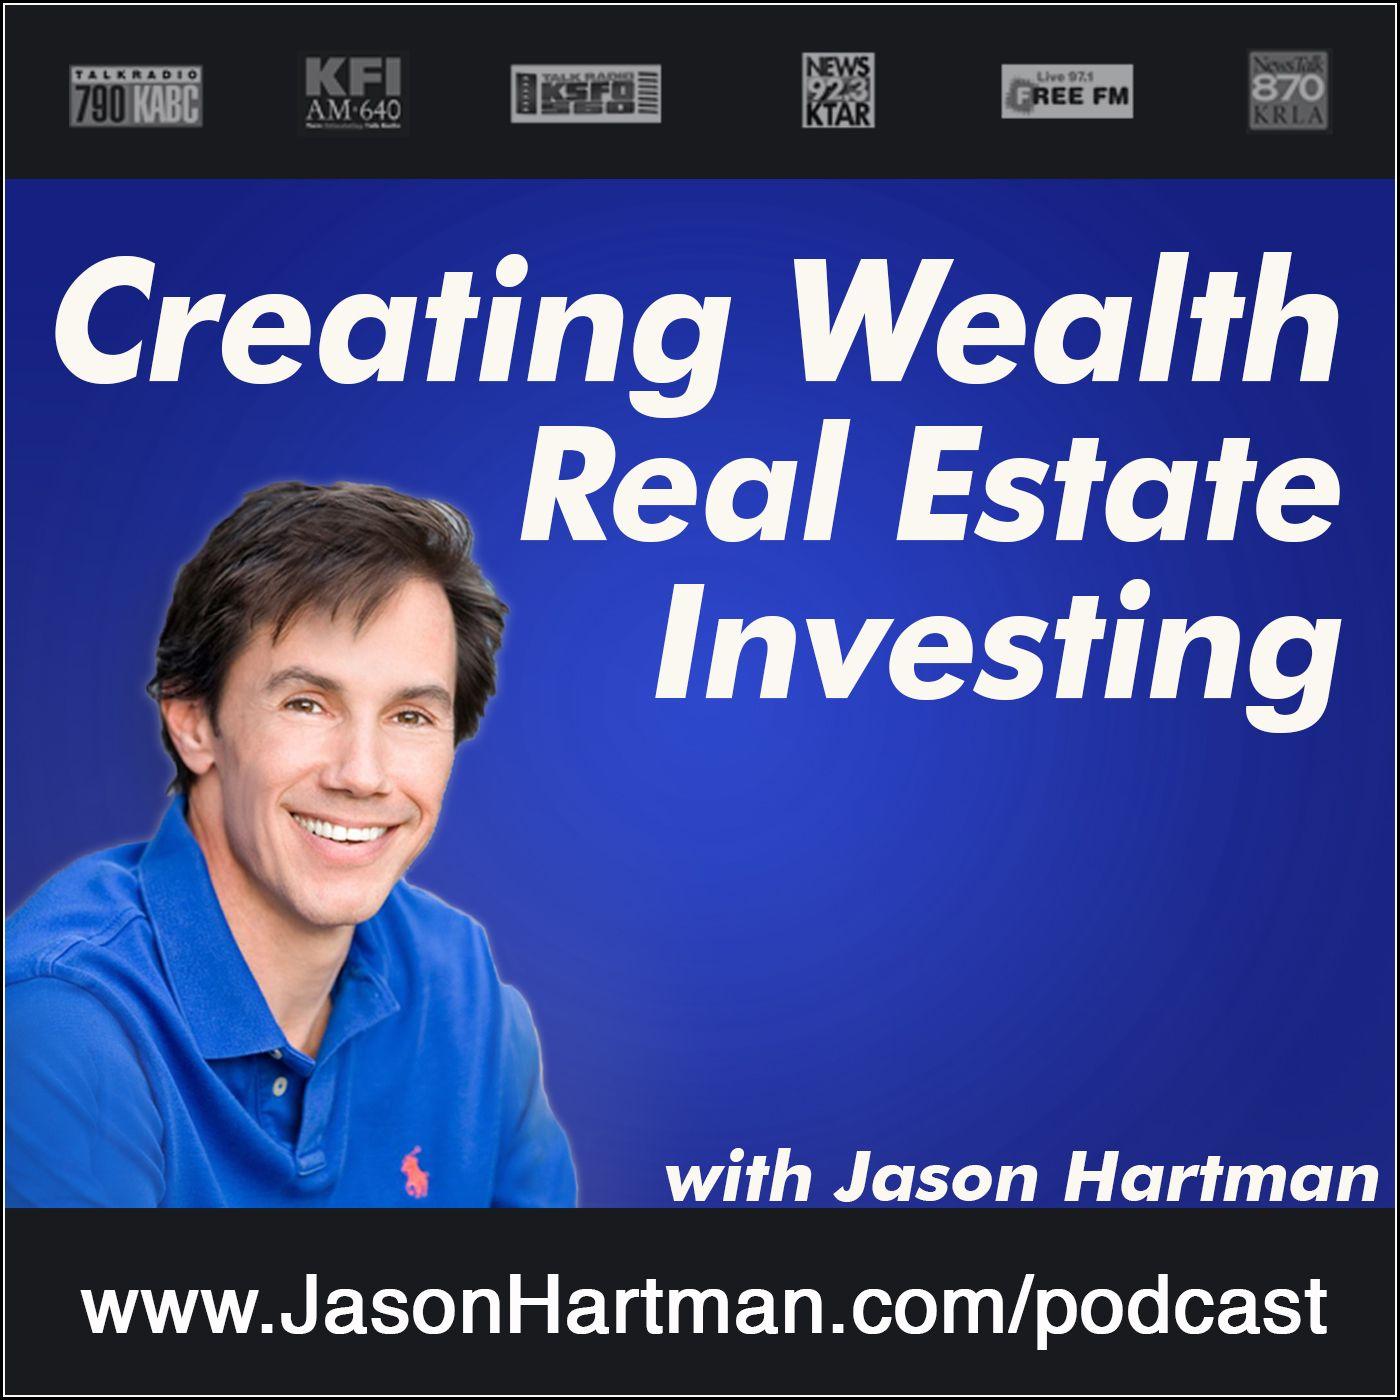 Creating Wealth Real Estate Investing:Jason Hartman